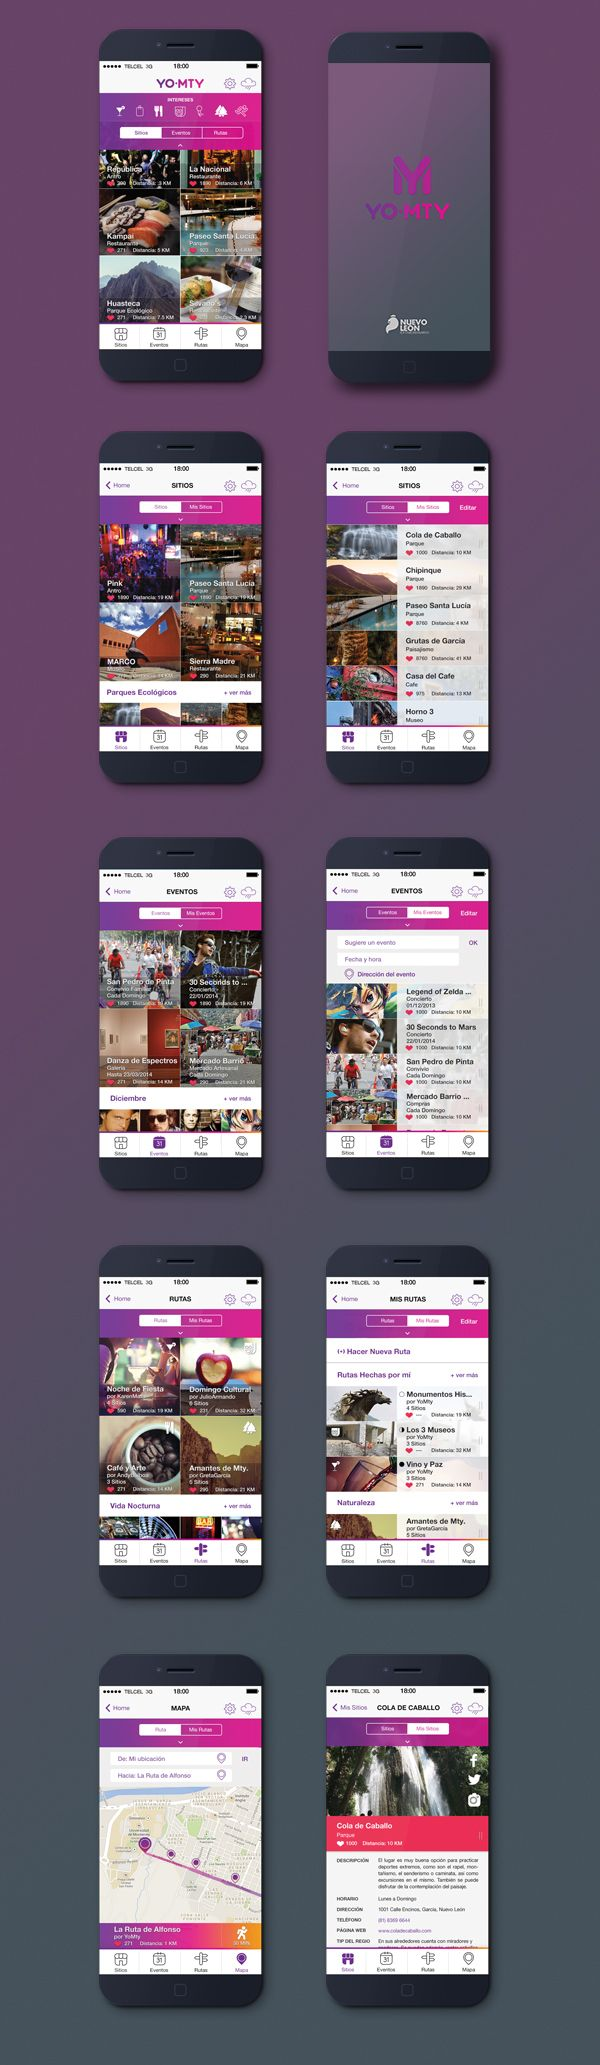 YO MTY on App Design Served